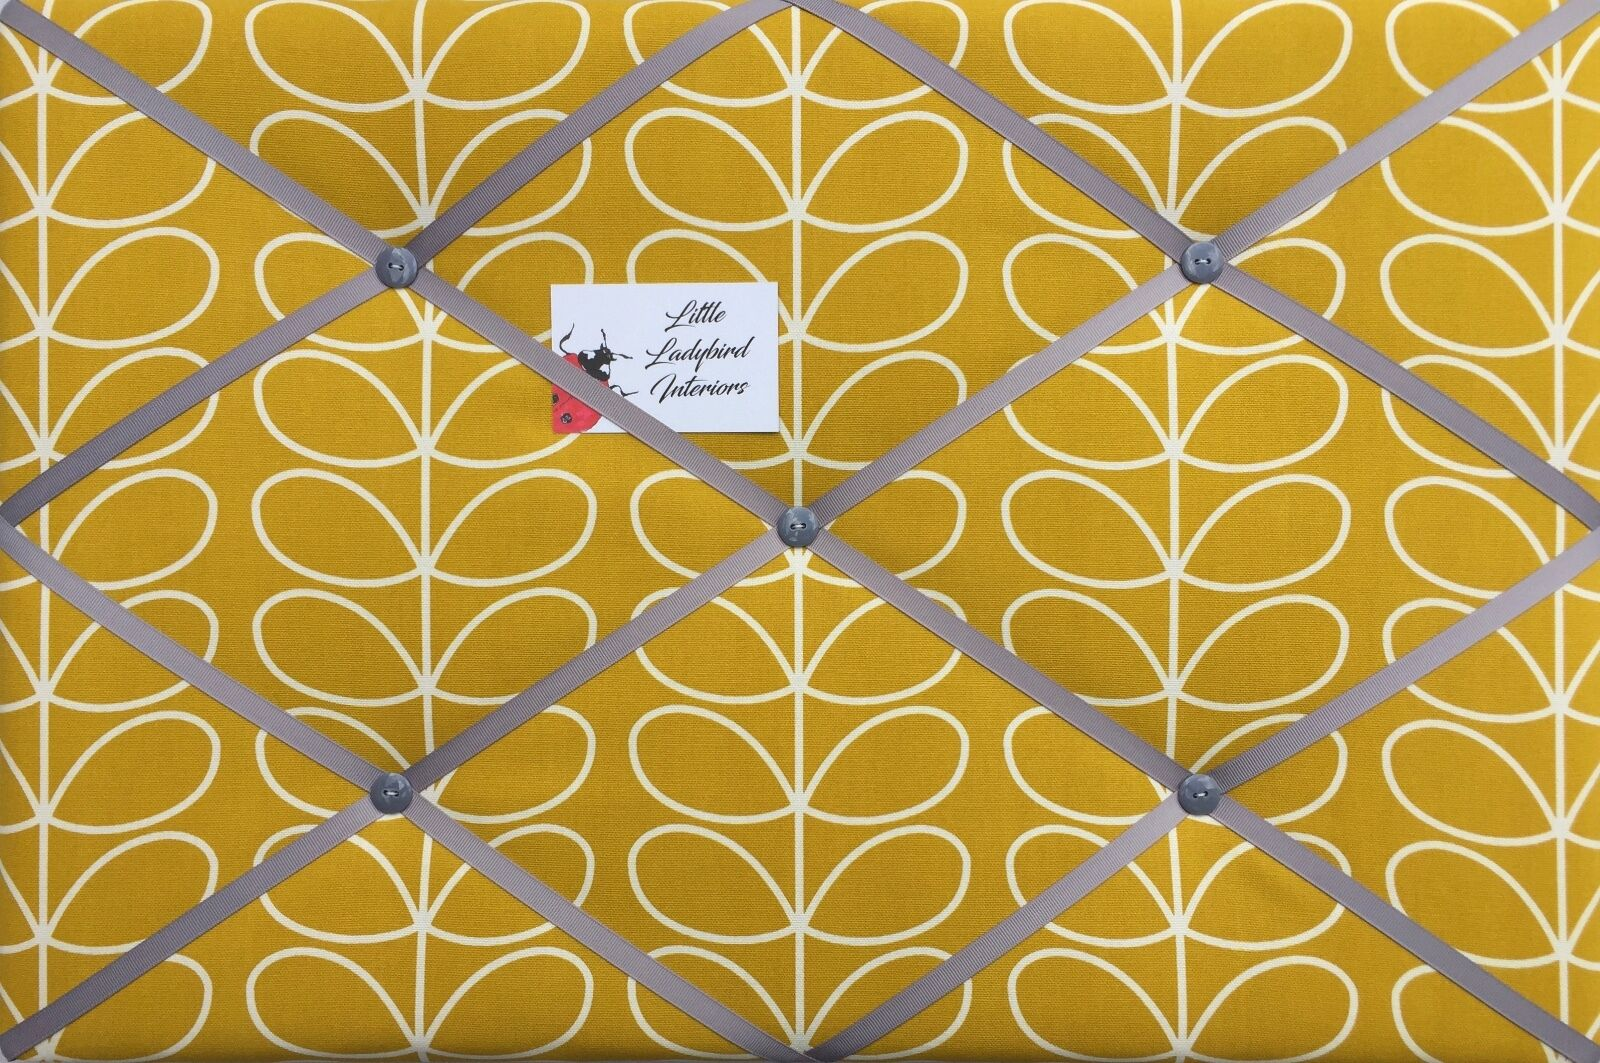 Custom Made Tissu PIN/mémo/Avis liège conseil Orla Kiely tige linéaire tige Kiely tissus 7f5090